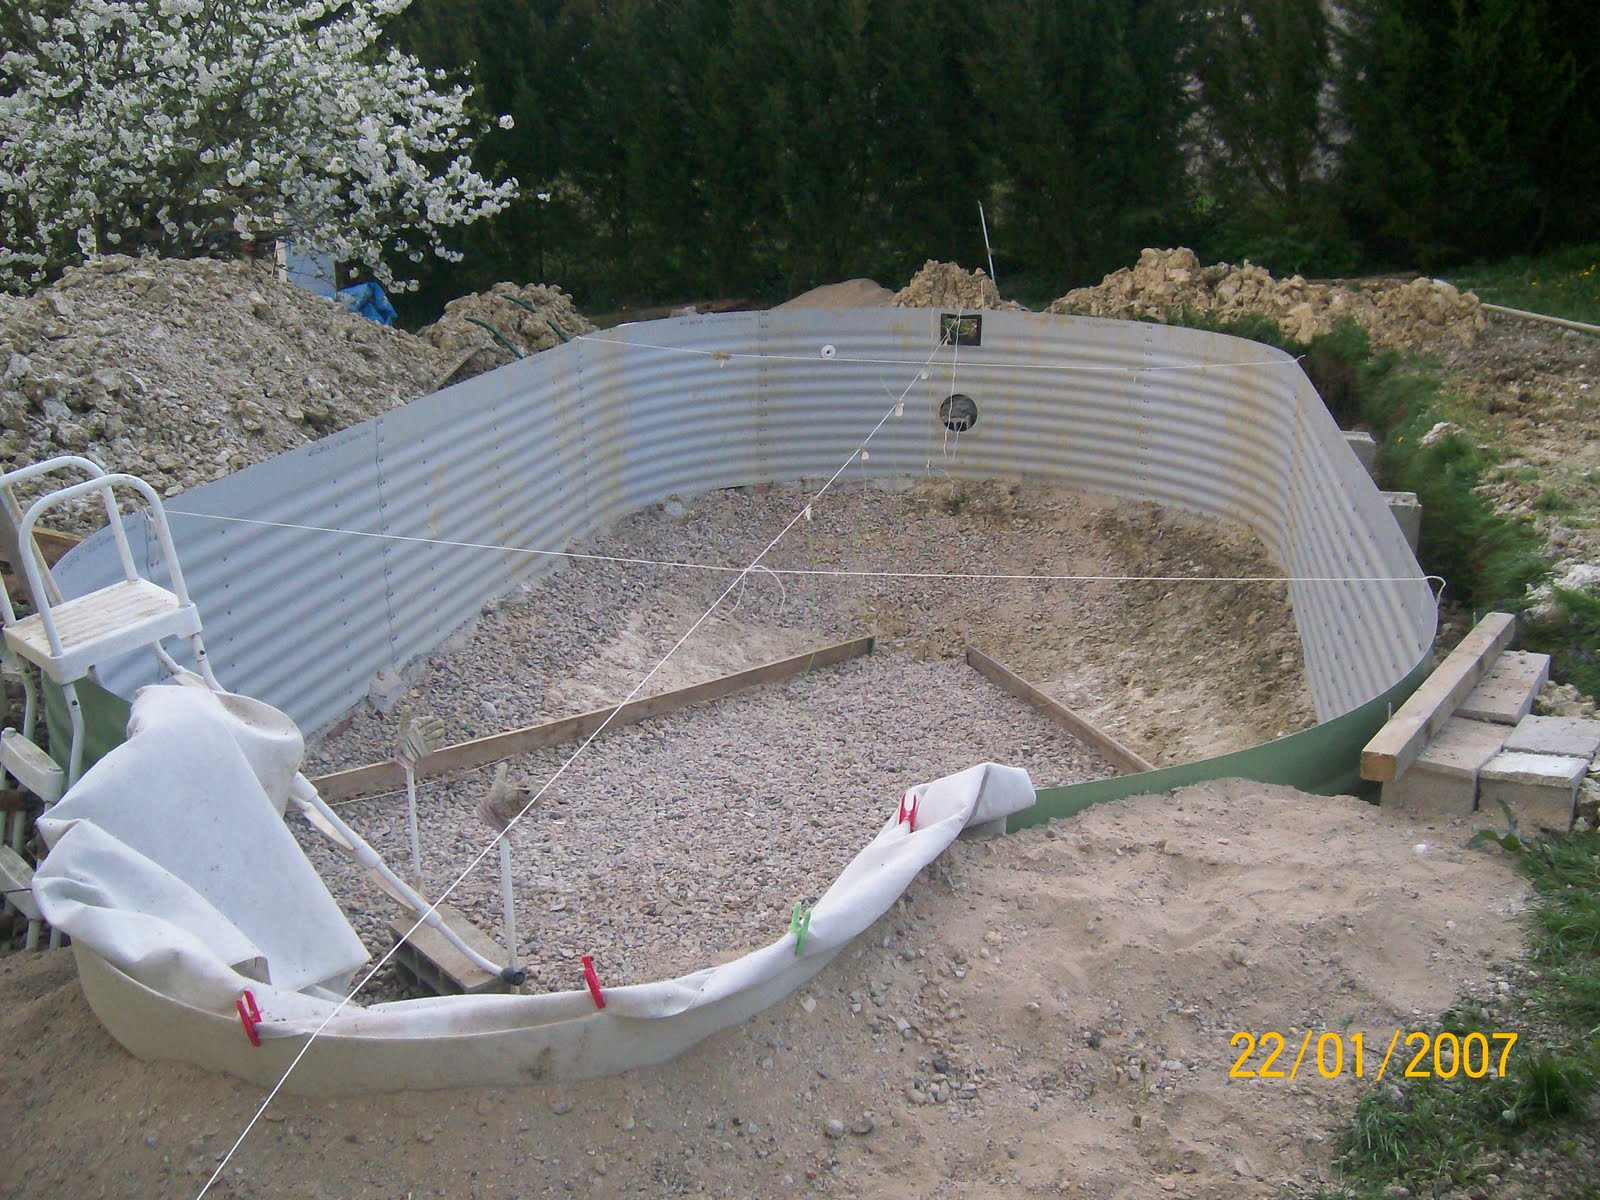 Notre olivia waterair montage etc for Vider une piscine hors sol